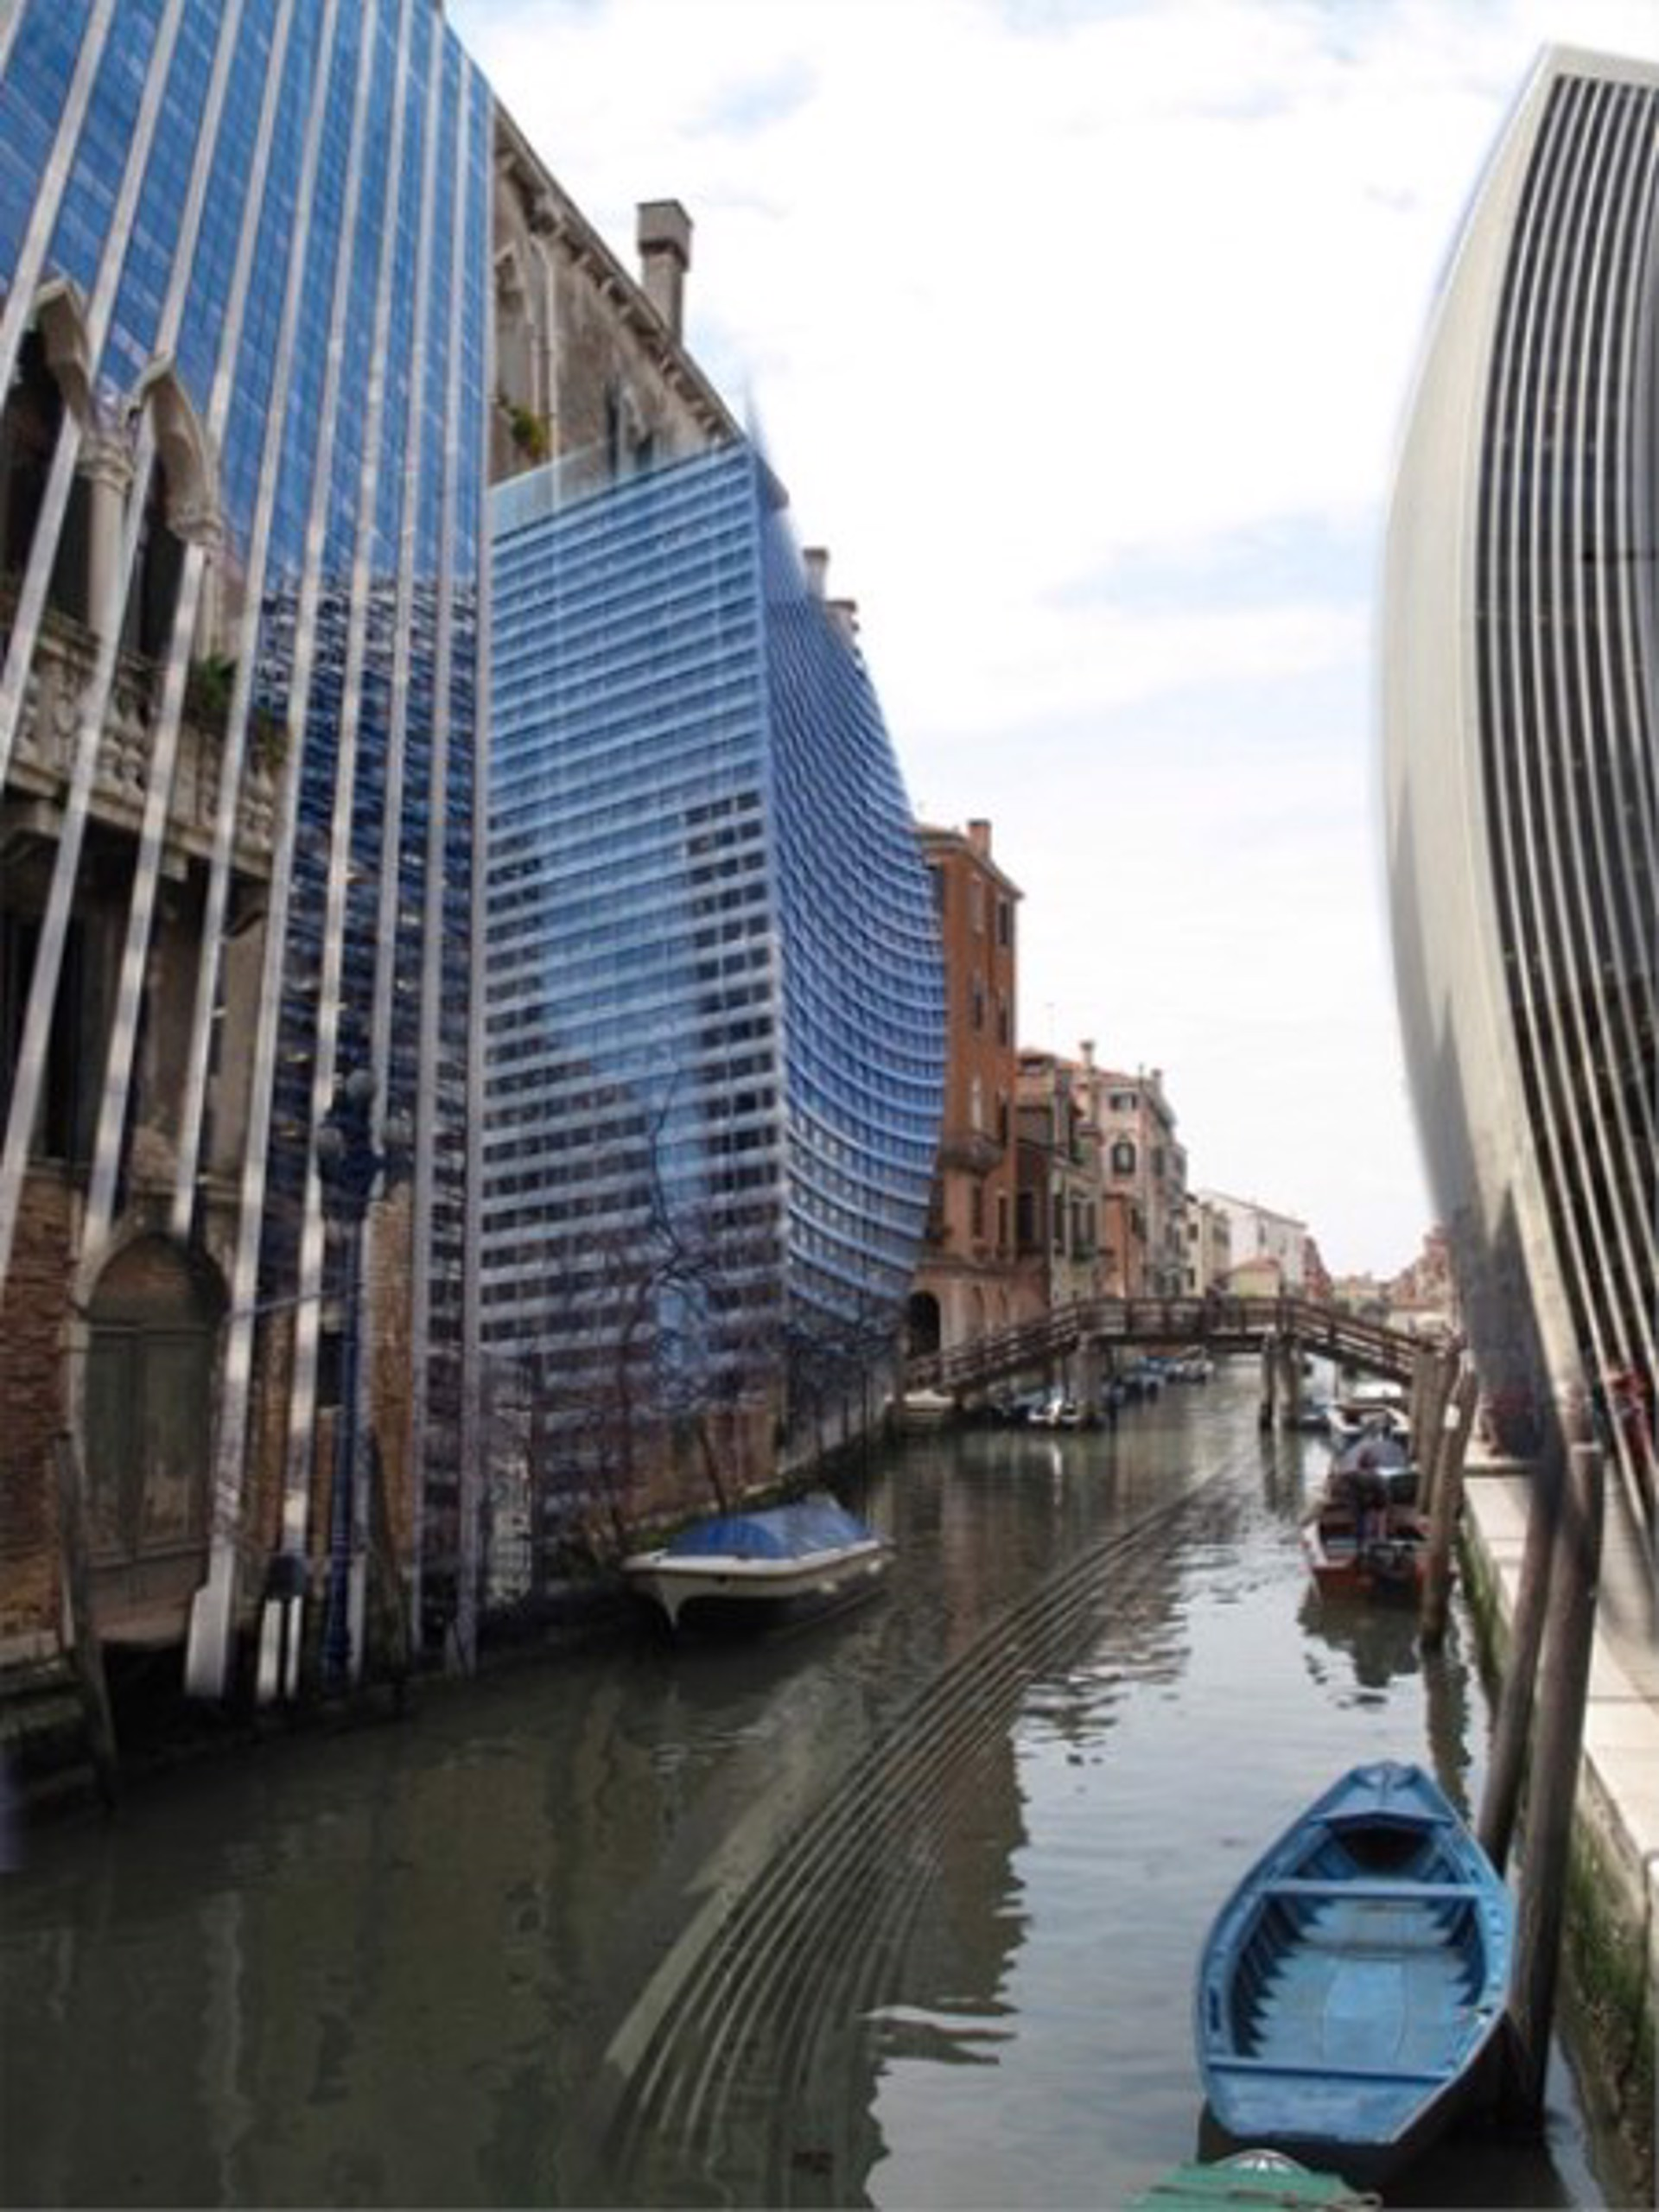 Venezia - San Francisco 2 by Lisa Borgiani